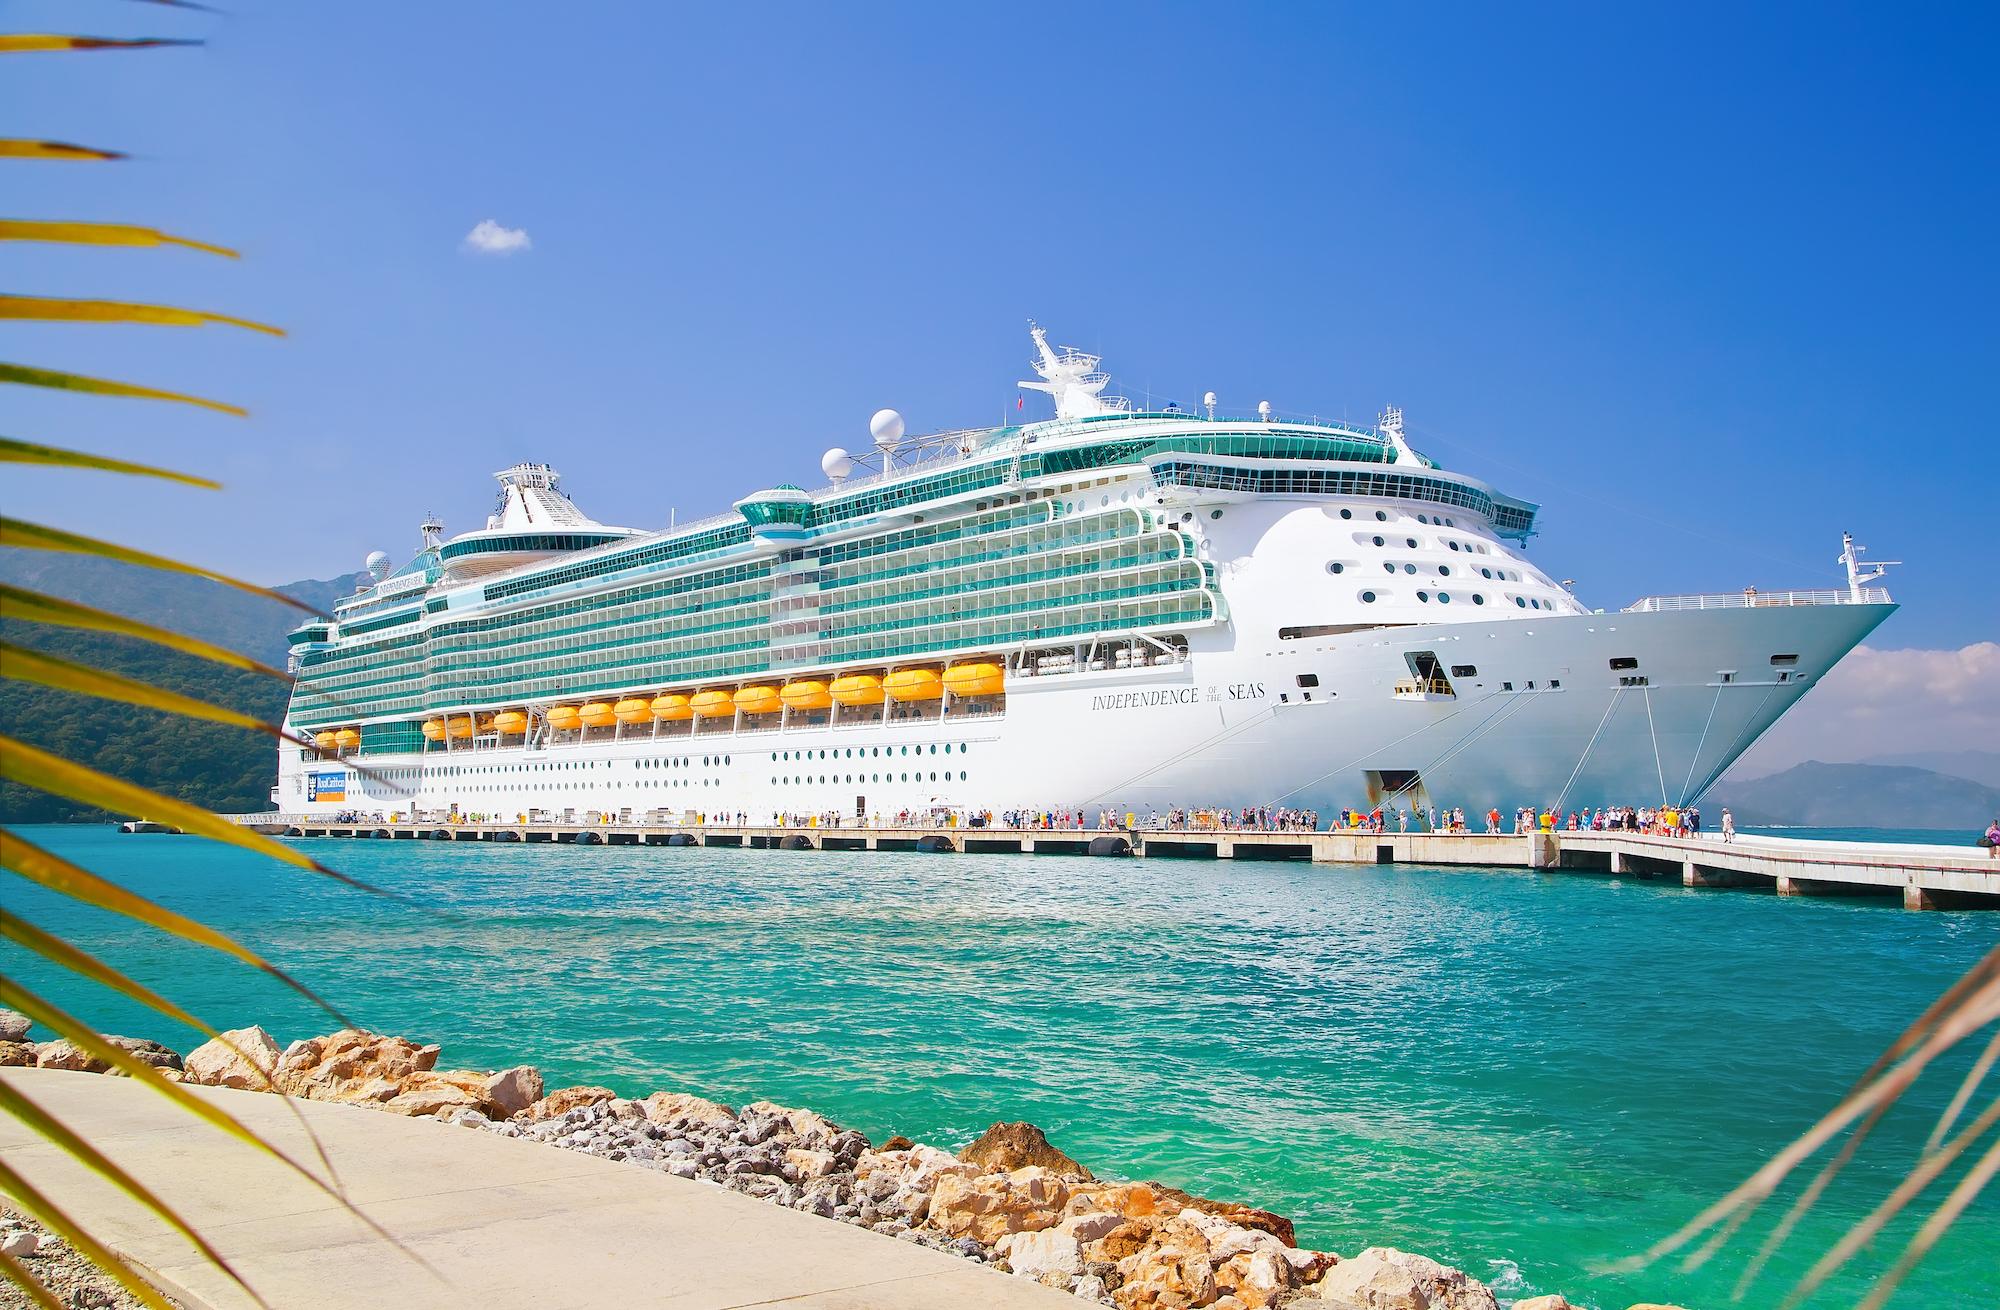 royal caribbean independence of the seas ship docked at Labadee